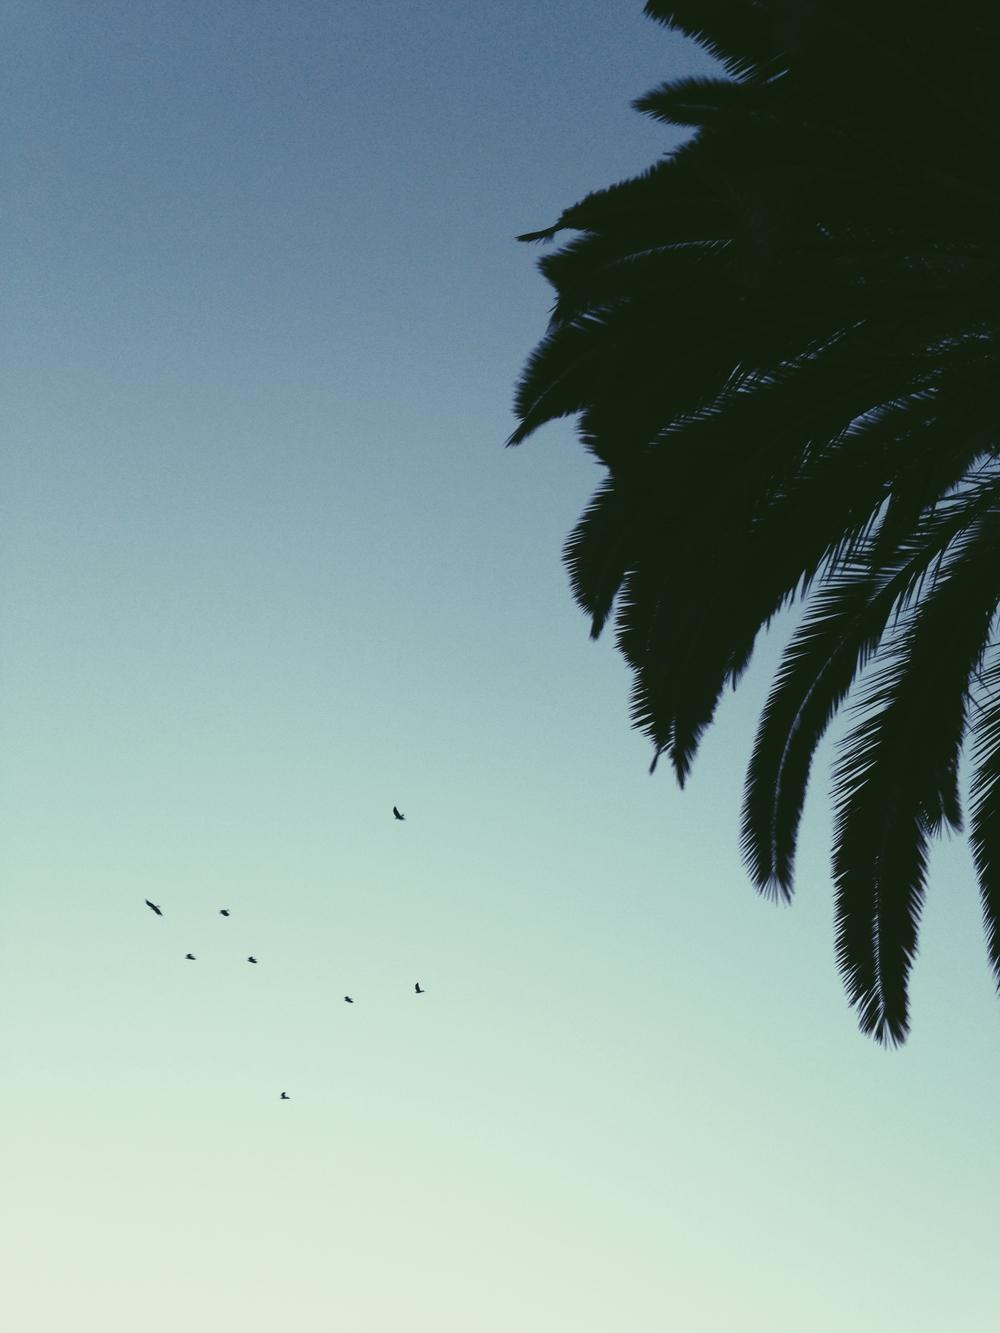 Los Angeles, California where Gossamer & Violet is based.